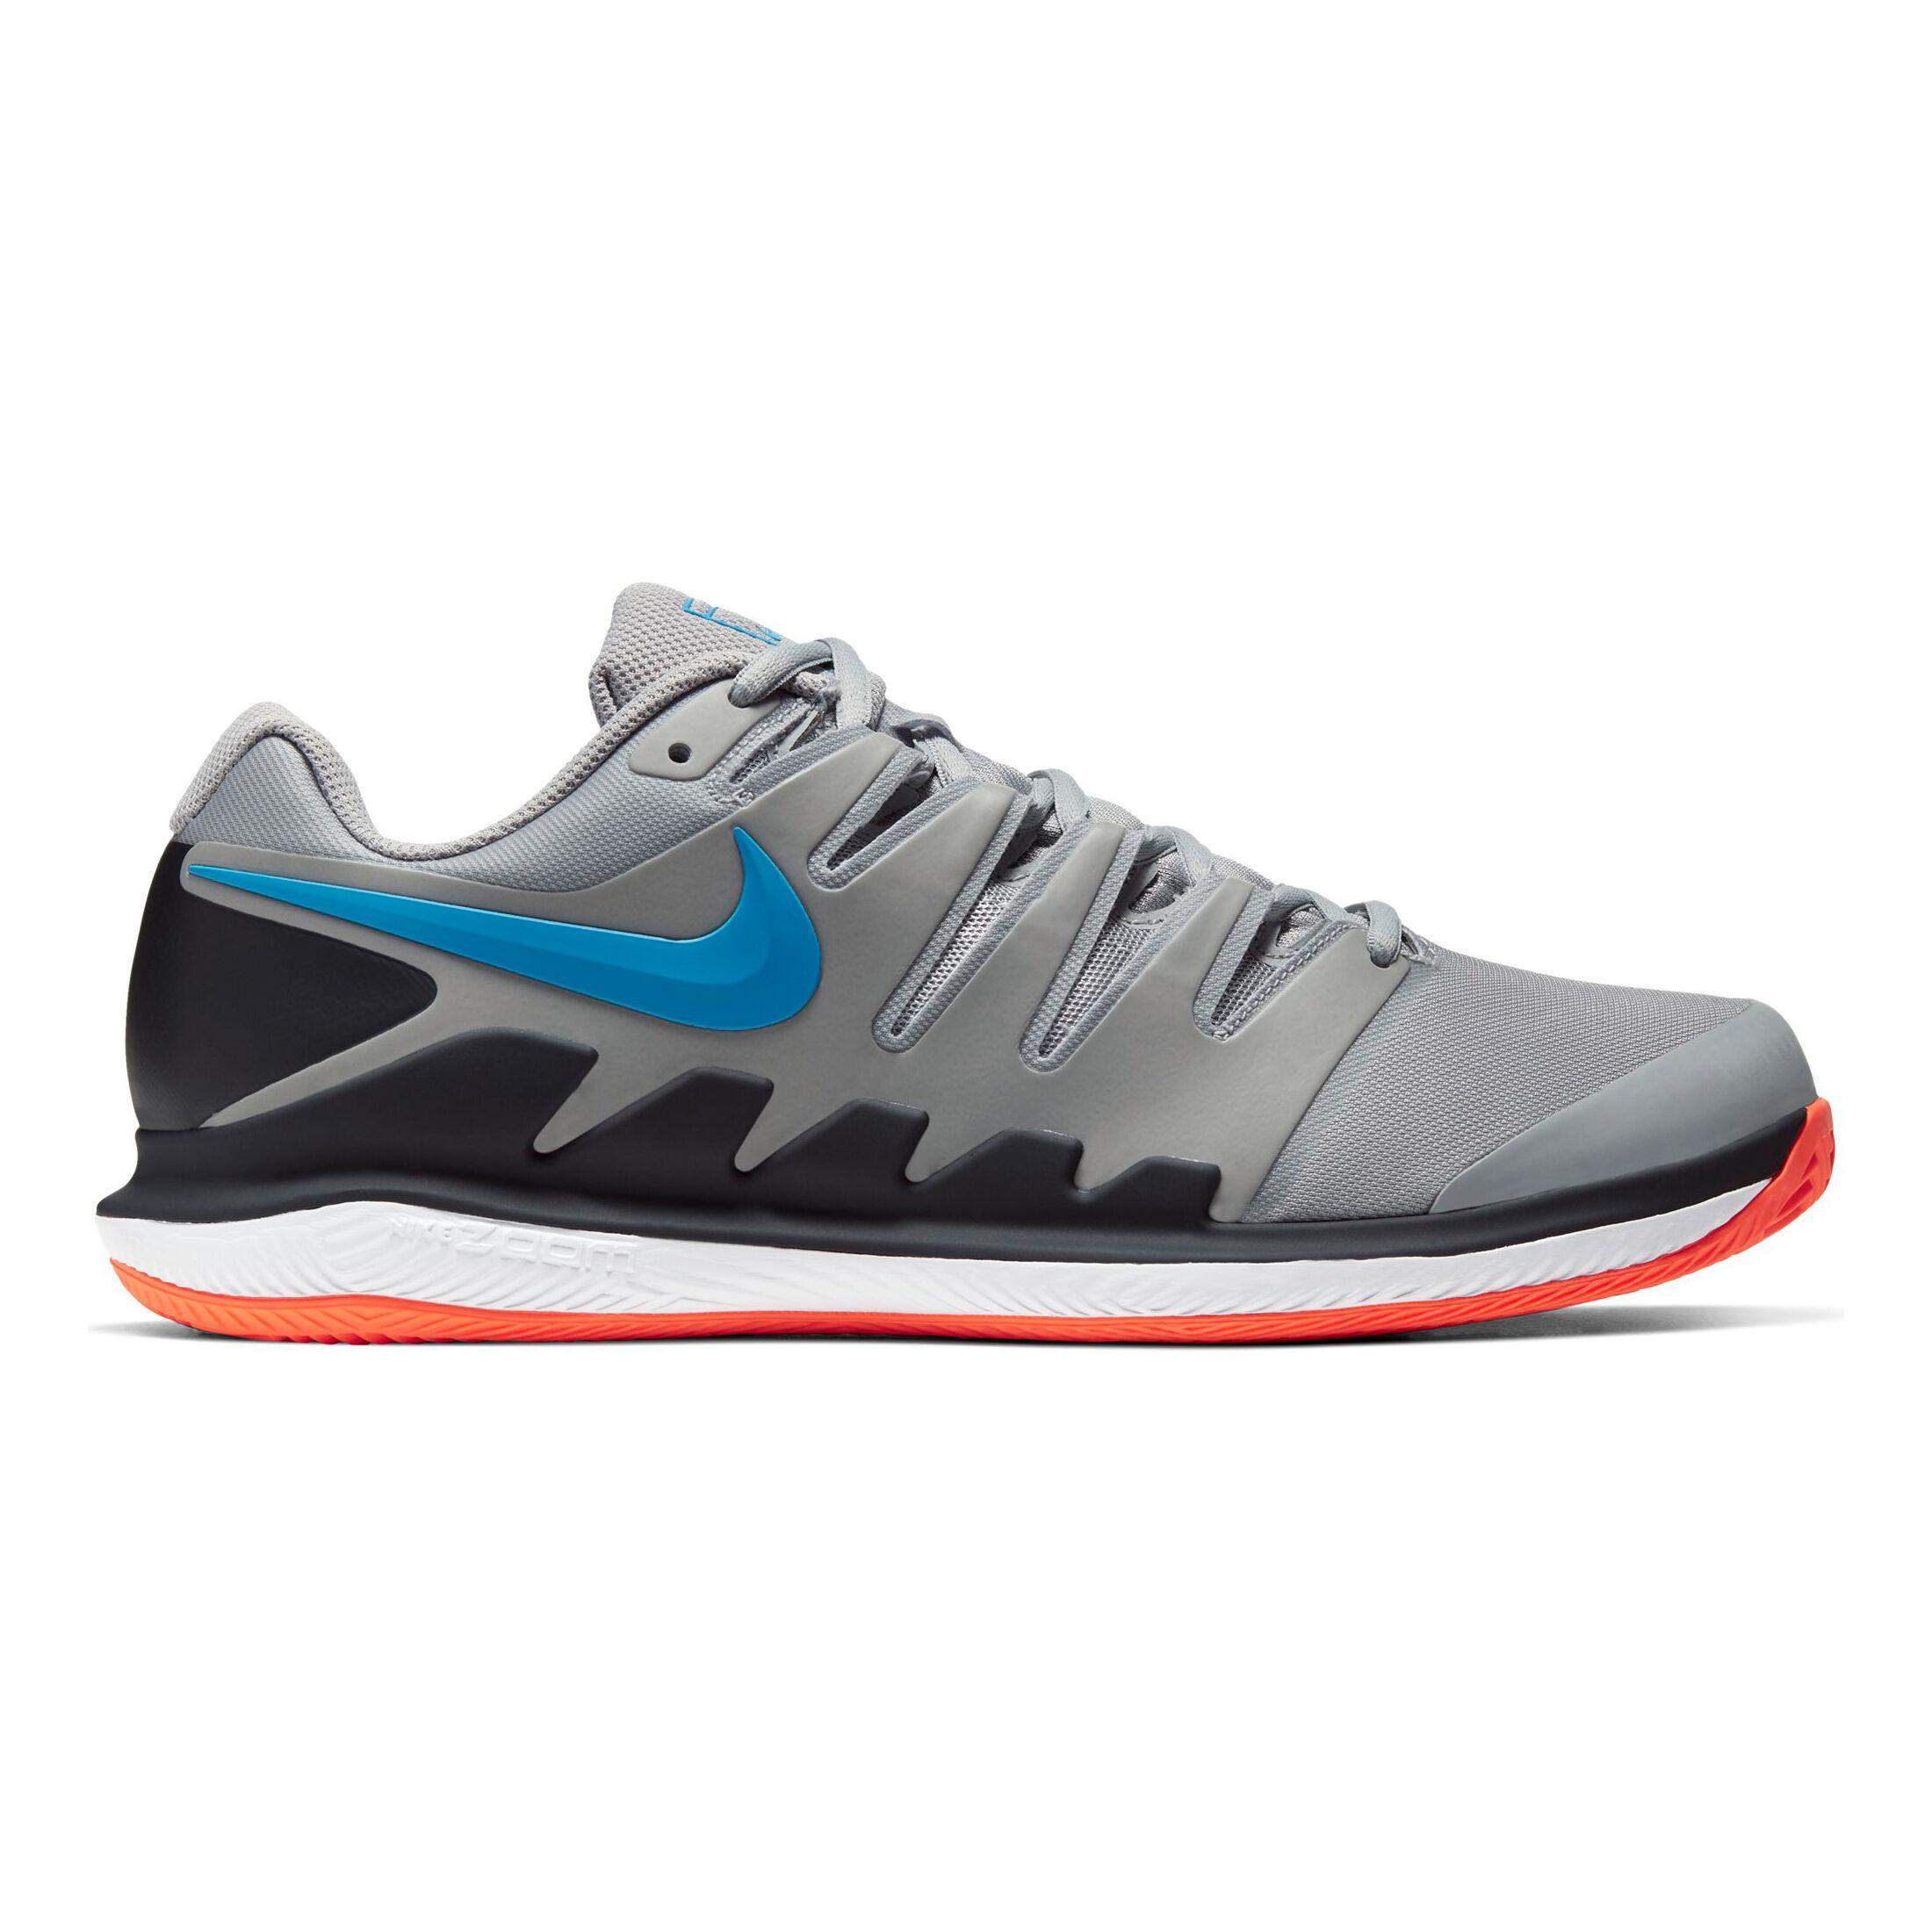 Chaussures Nike Air Zoom Vapor X Rouge Blanc Bleu 2019